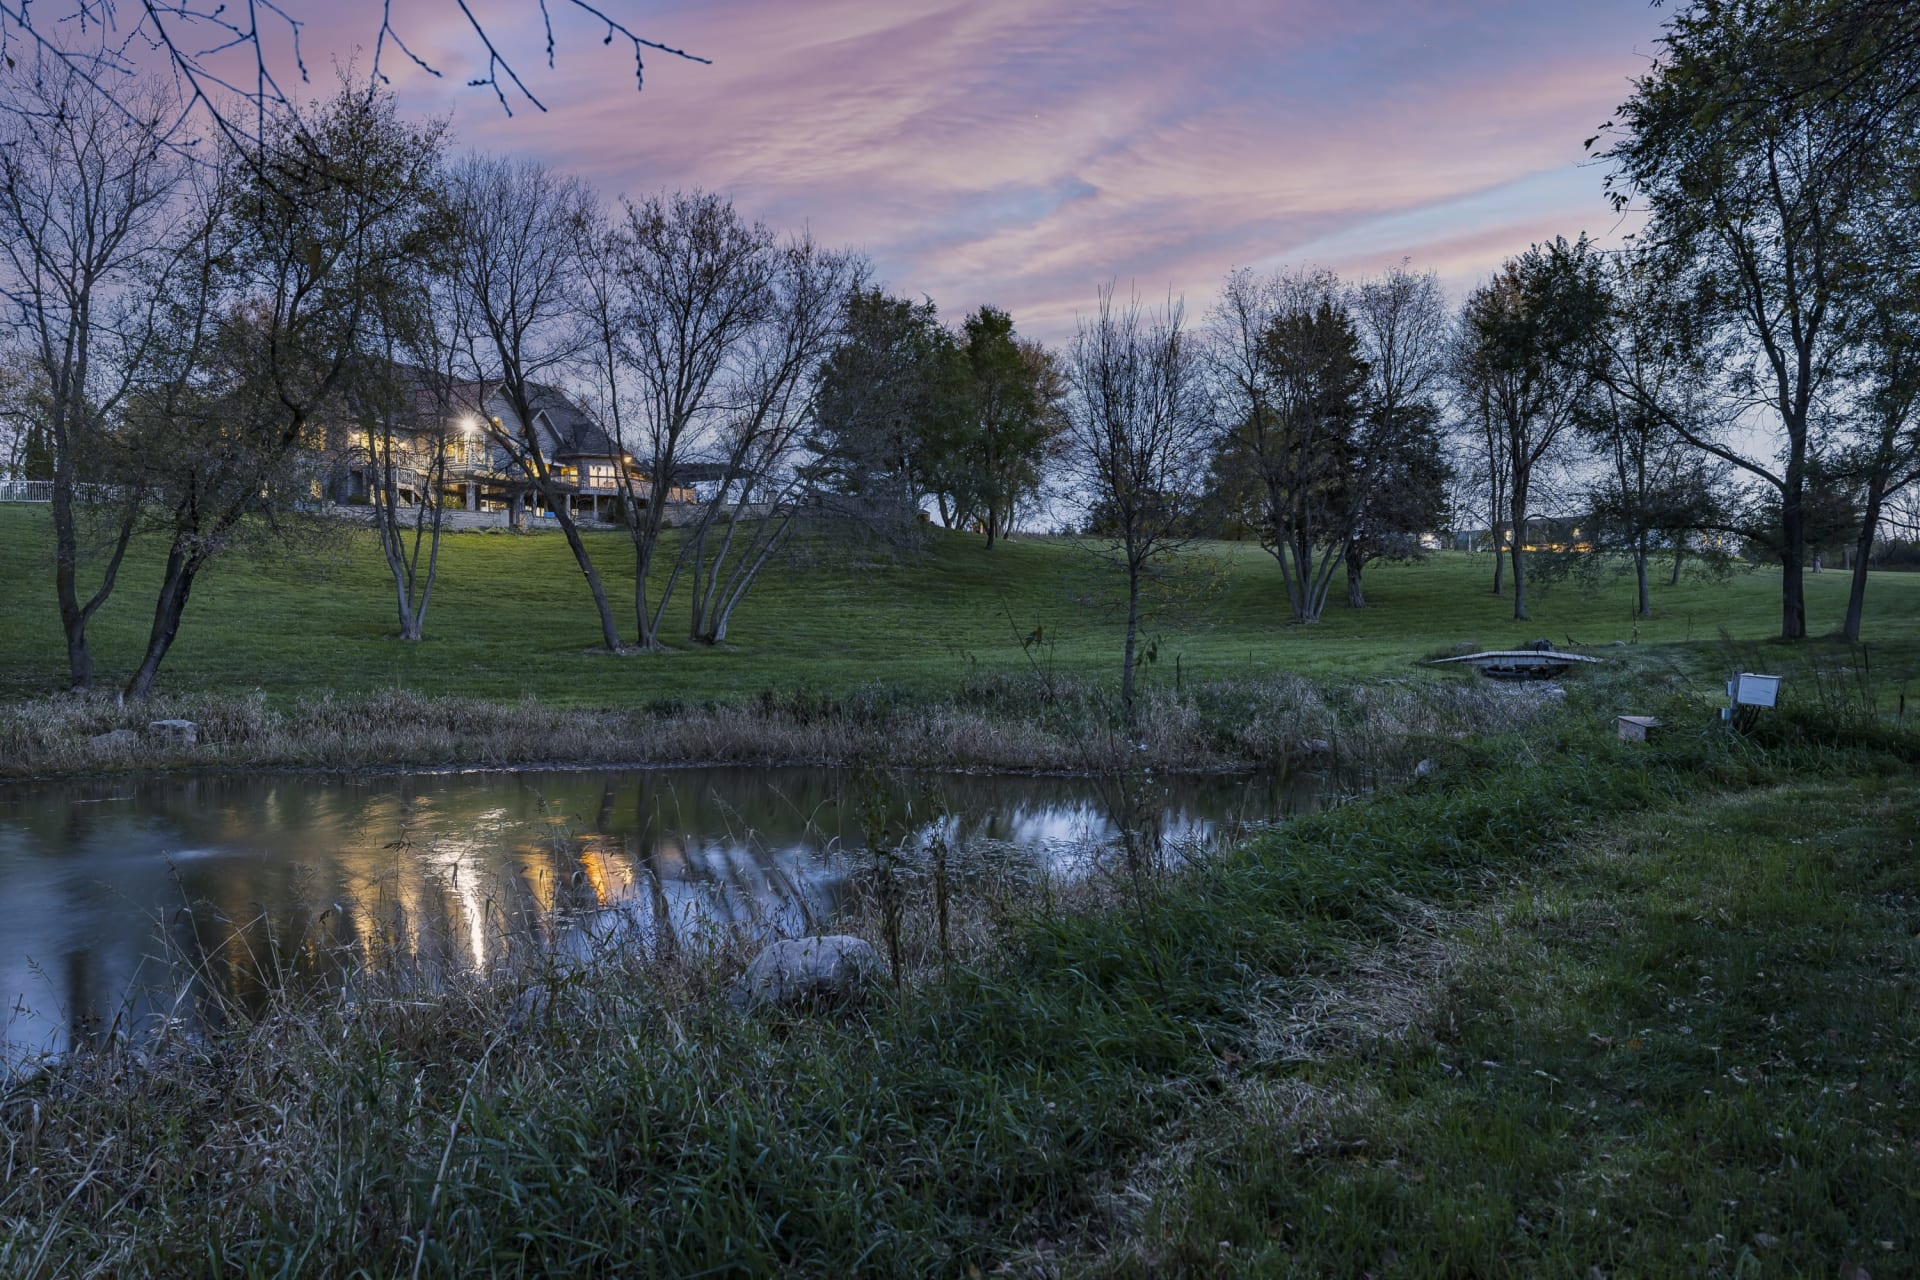 Stunning 2 Million Dollar Acreage Hits the Market in Carver, Minnesota